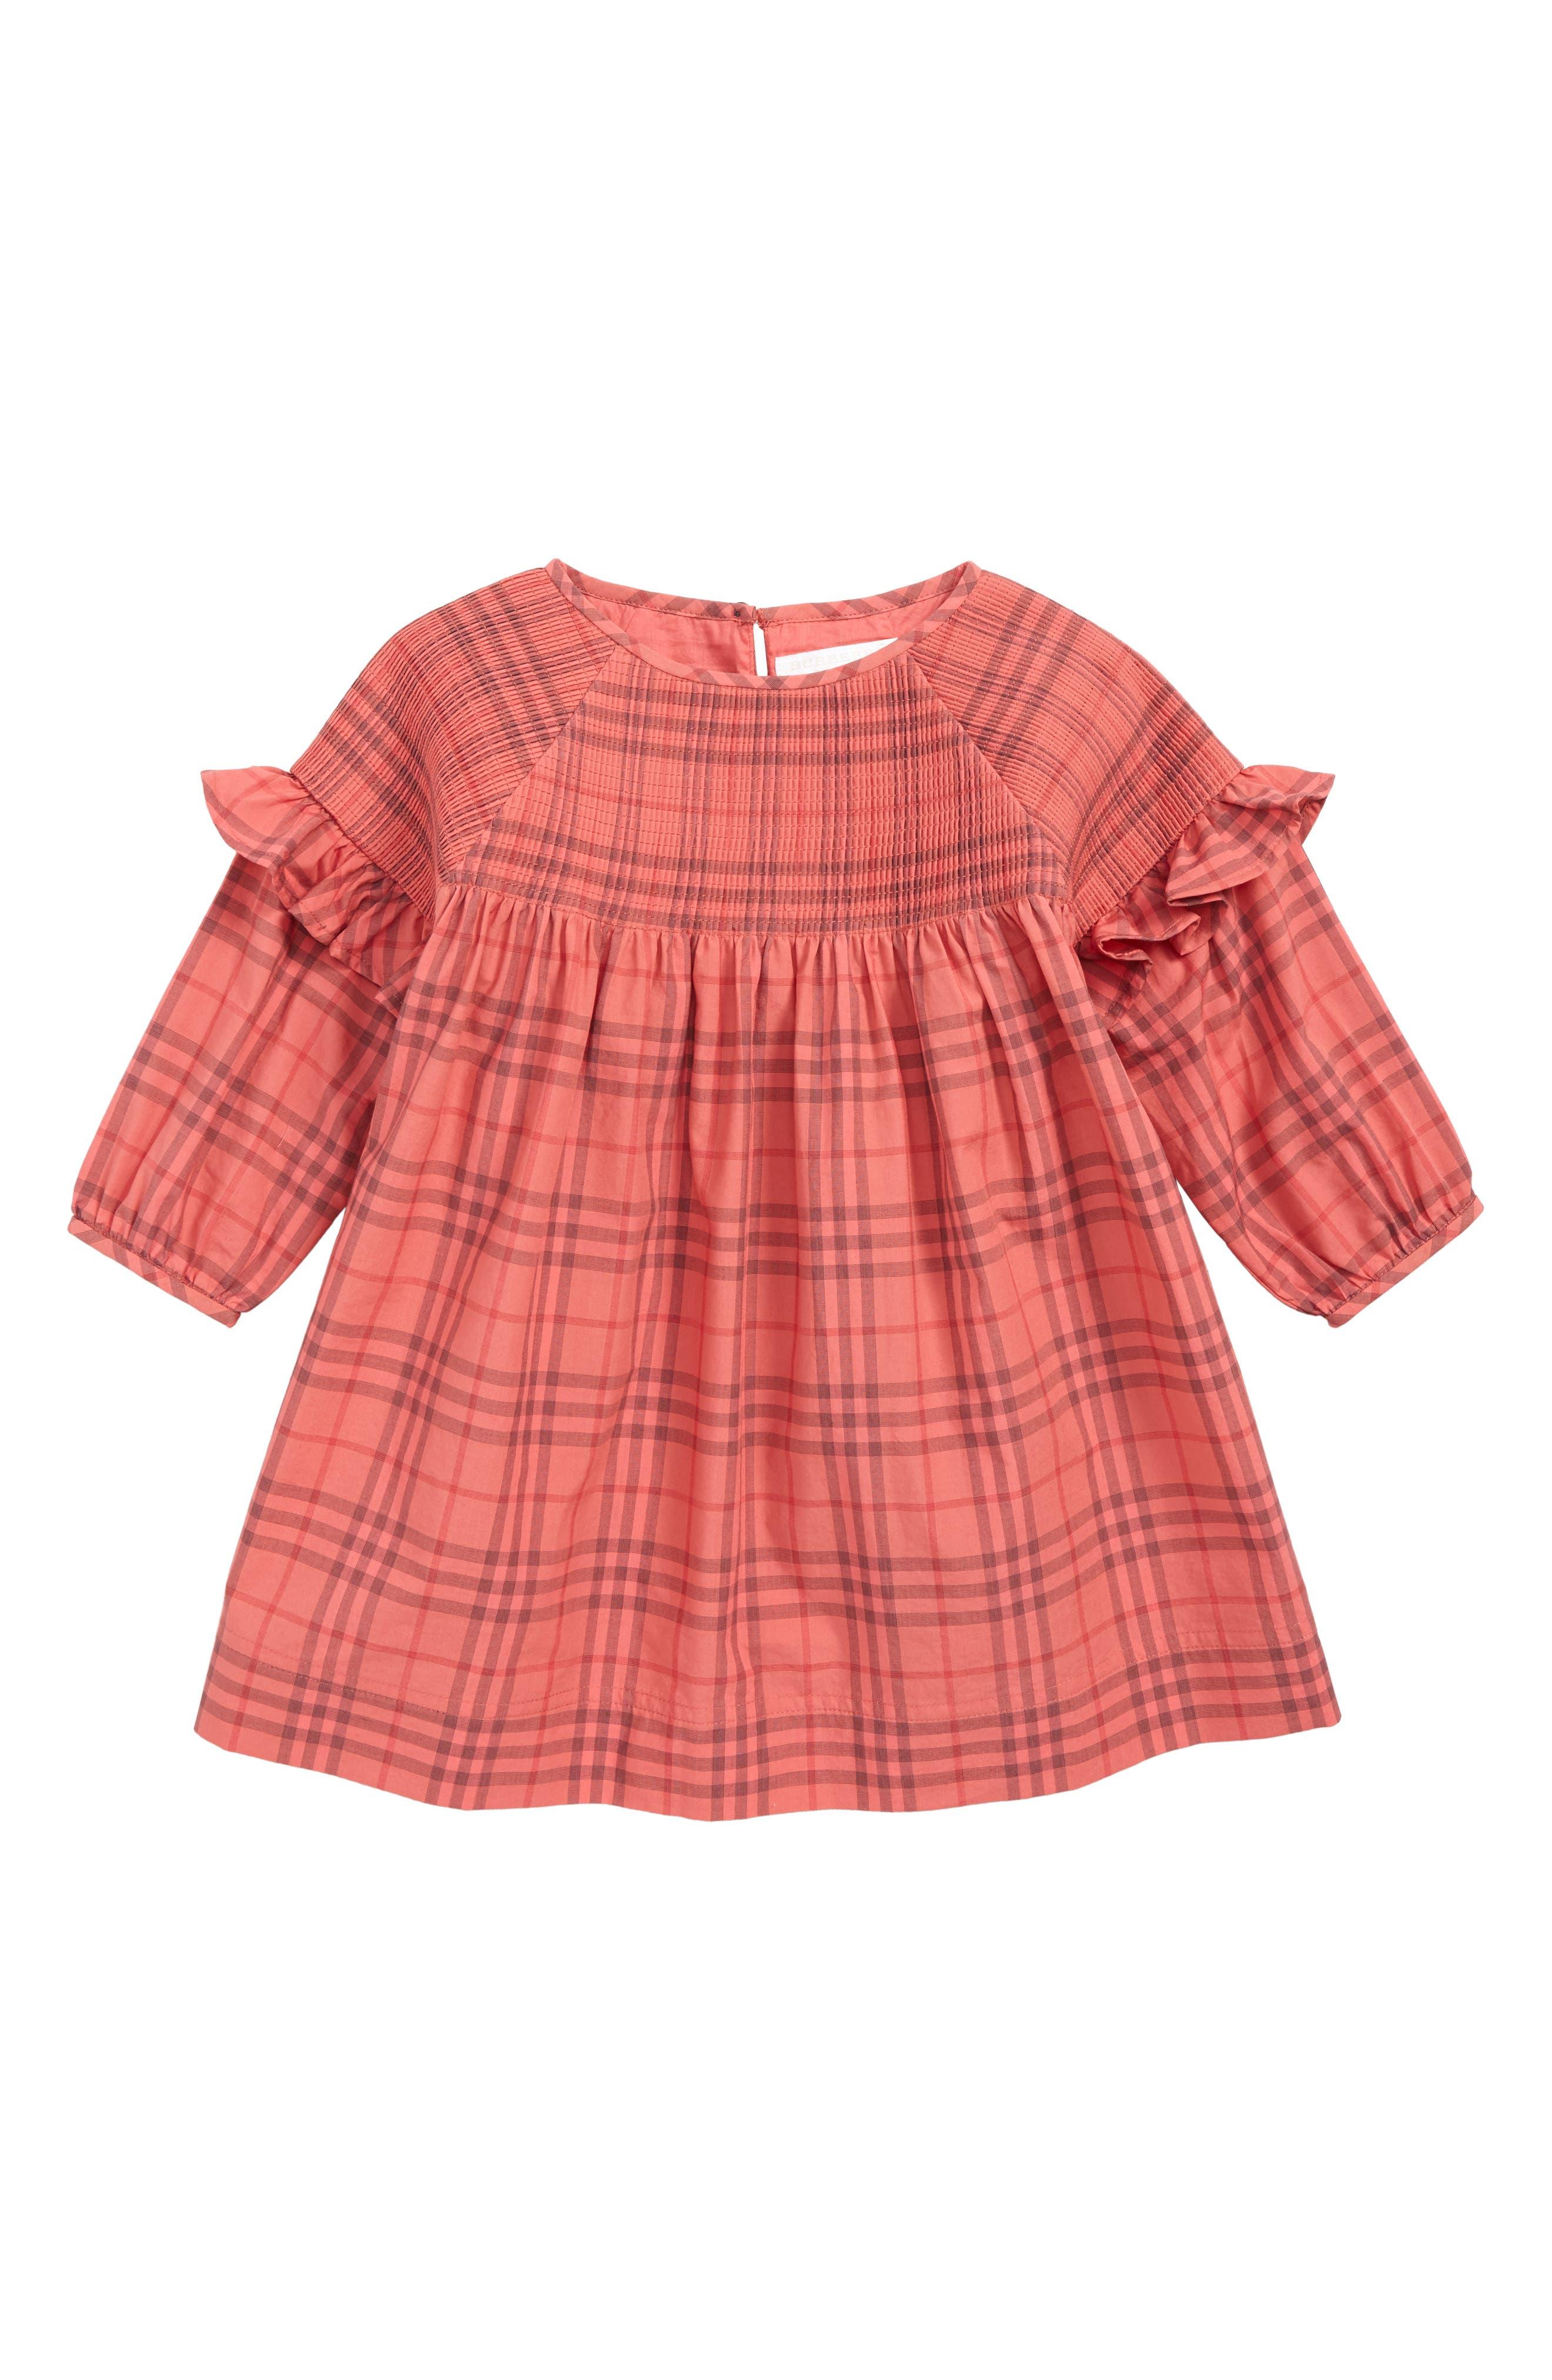 Mini Loralie Ruffle Detail Check Cotton Dress,                             Main thumbnail 1, color,                             CORAL RED